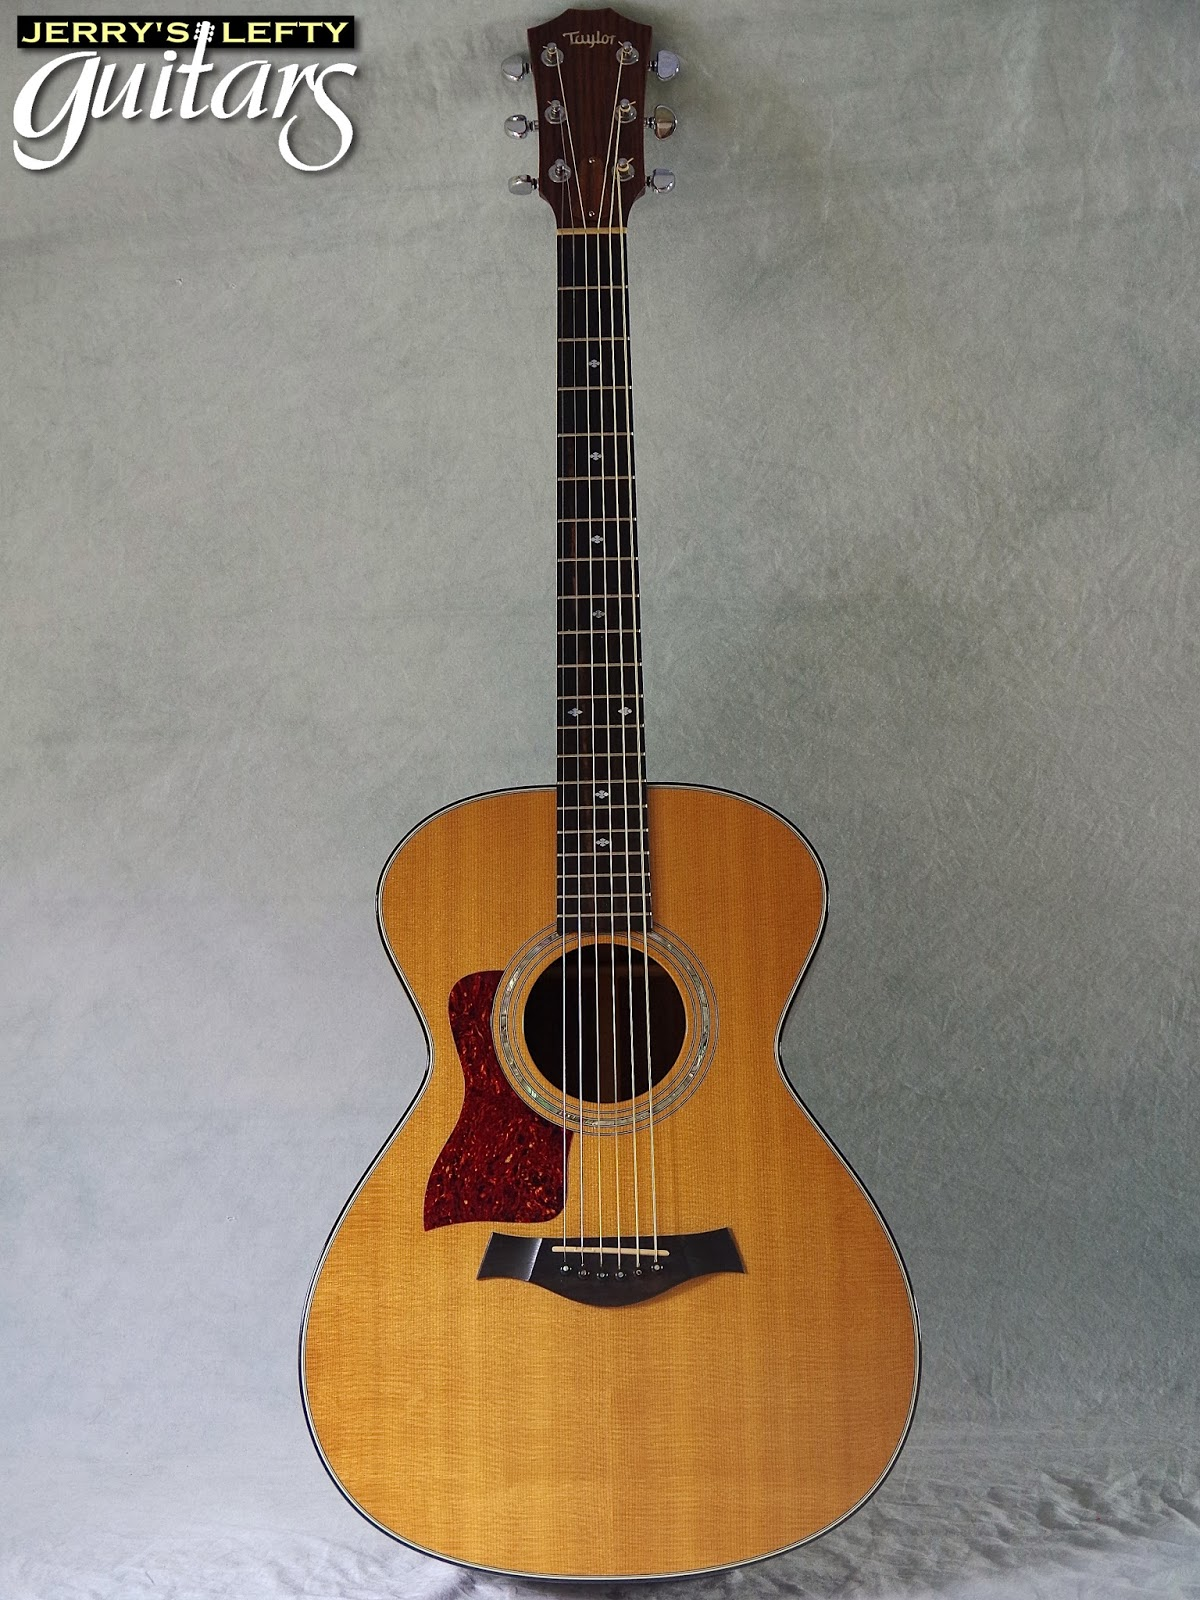 jerry 39 s lefty guitars newest guitar arrivals updated weekly 1994 taylor 512 used left handed. Black Bedroom Furniture Sets. Home Design Ideas